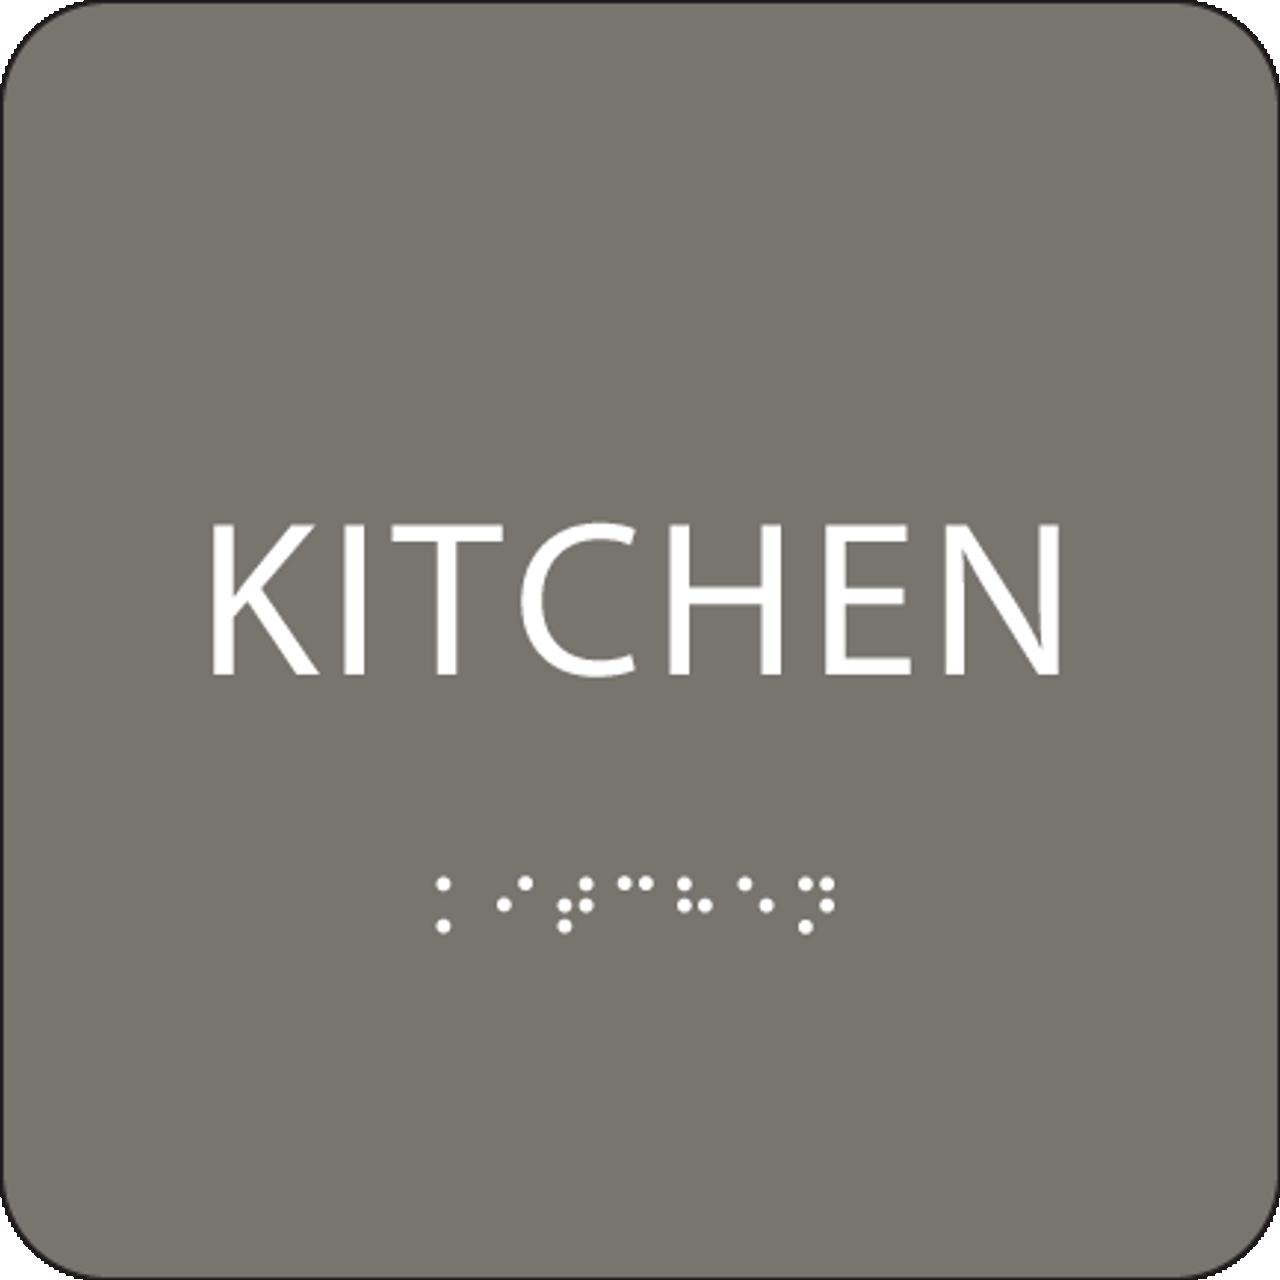 Grey Tactile Kitchen Sign